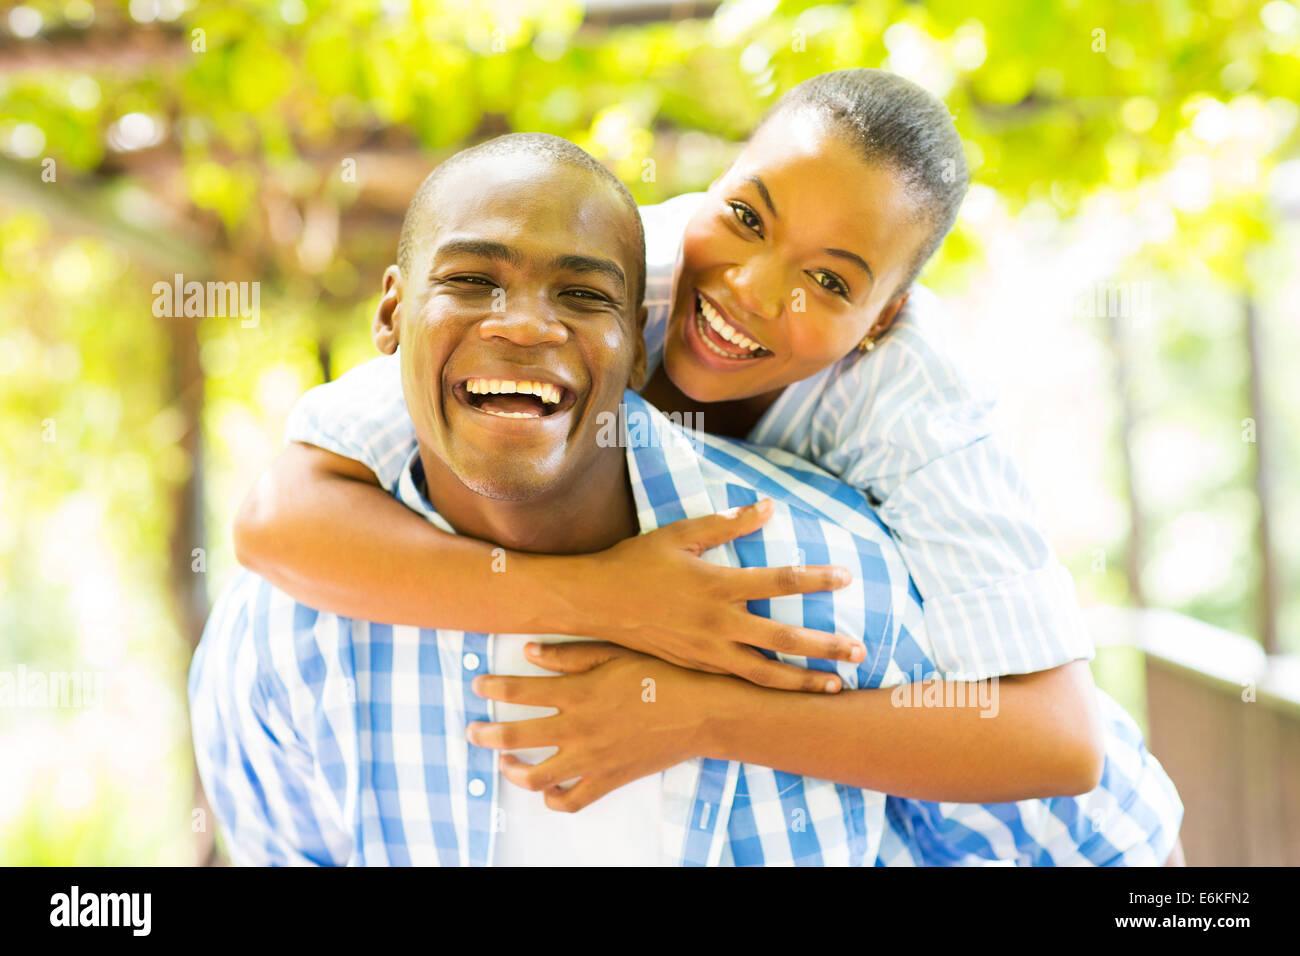 Feliz mujer africana disfrutando piggyback suban novio afuera Imagen De Stock